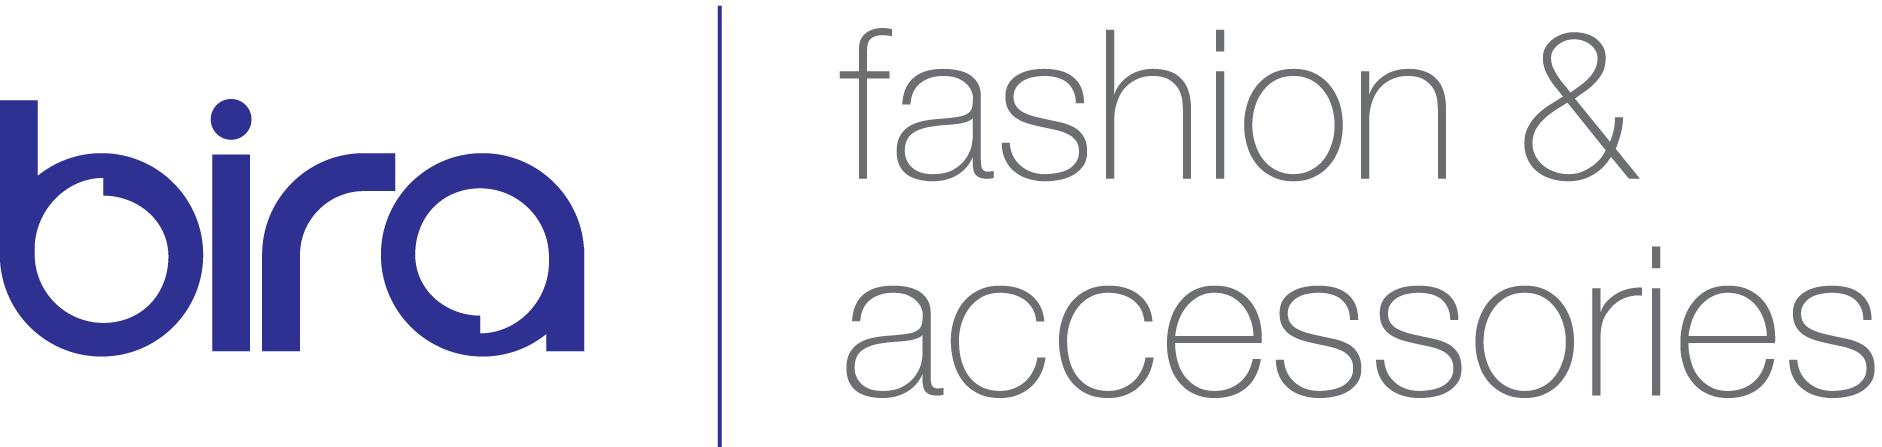 Fashion & Accessories Logo